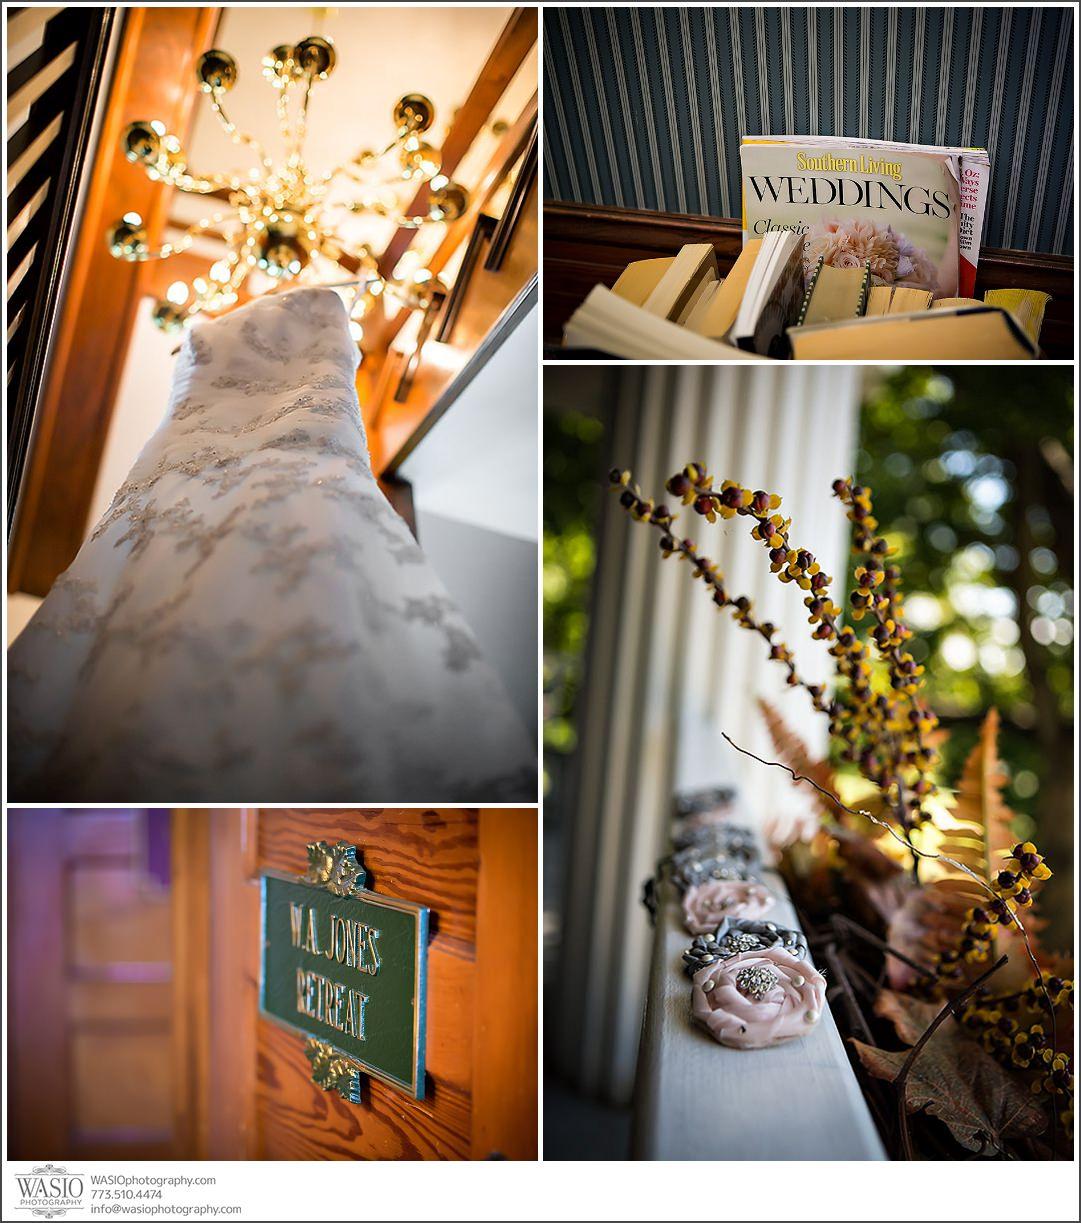 wedding-photography-in-indiana-064-wedding-details-terrace Wedding Photography in Indiana - Natalie + Jae